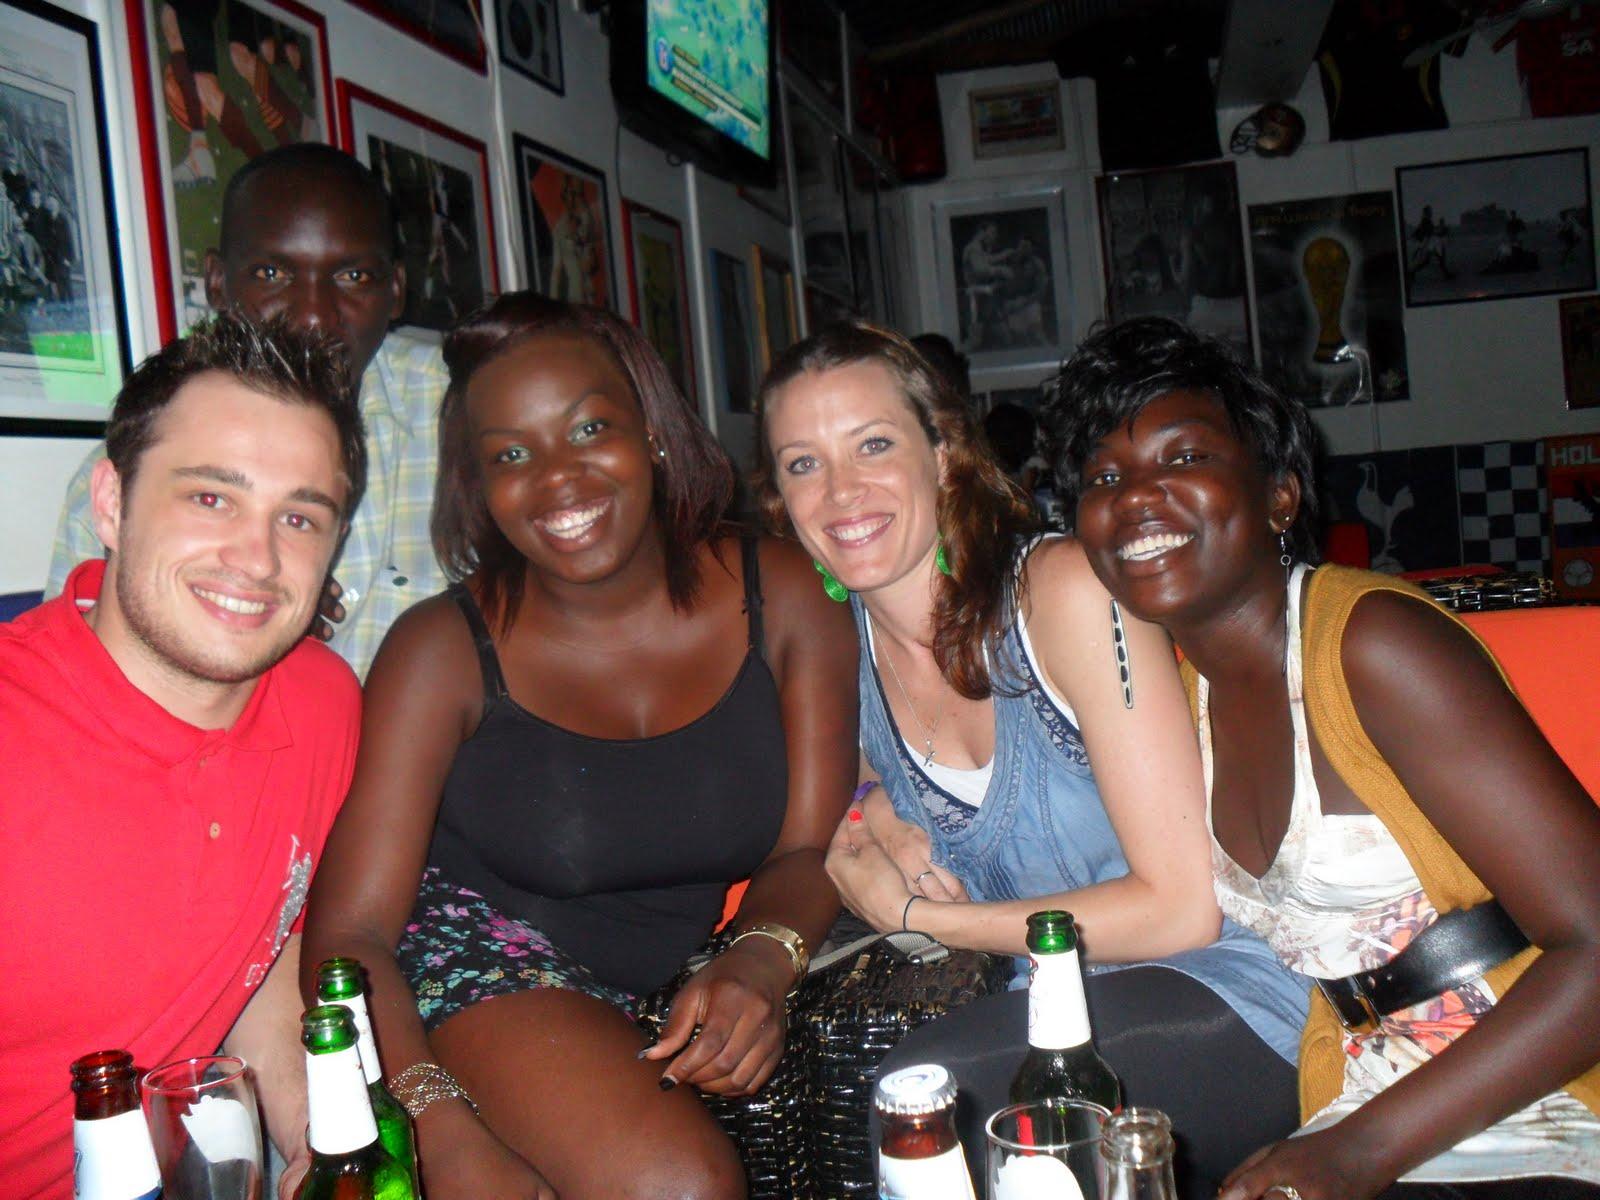 Nightlife in Uganda